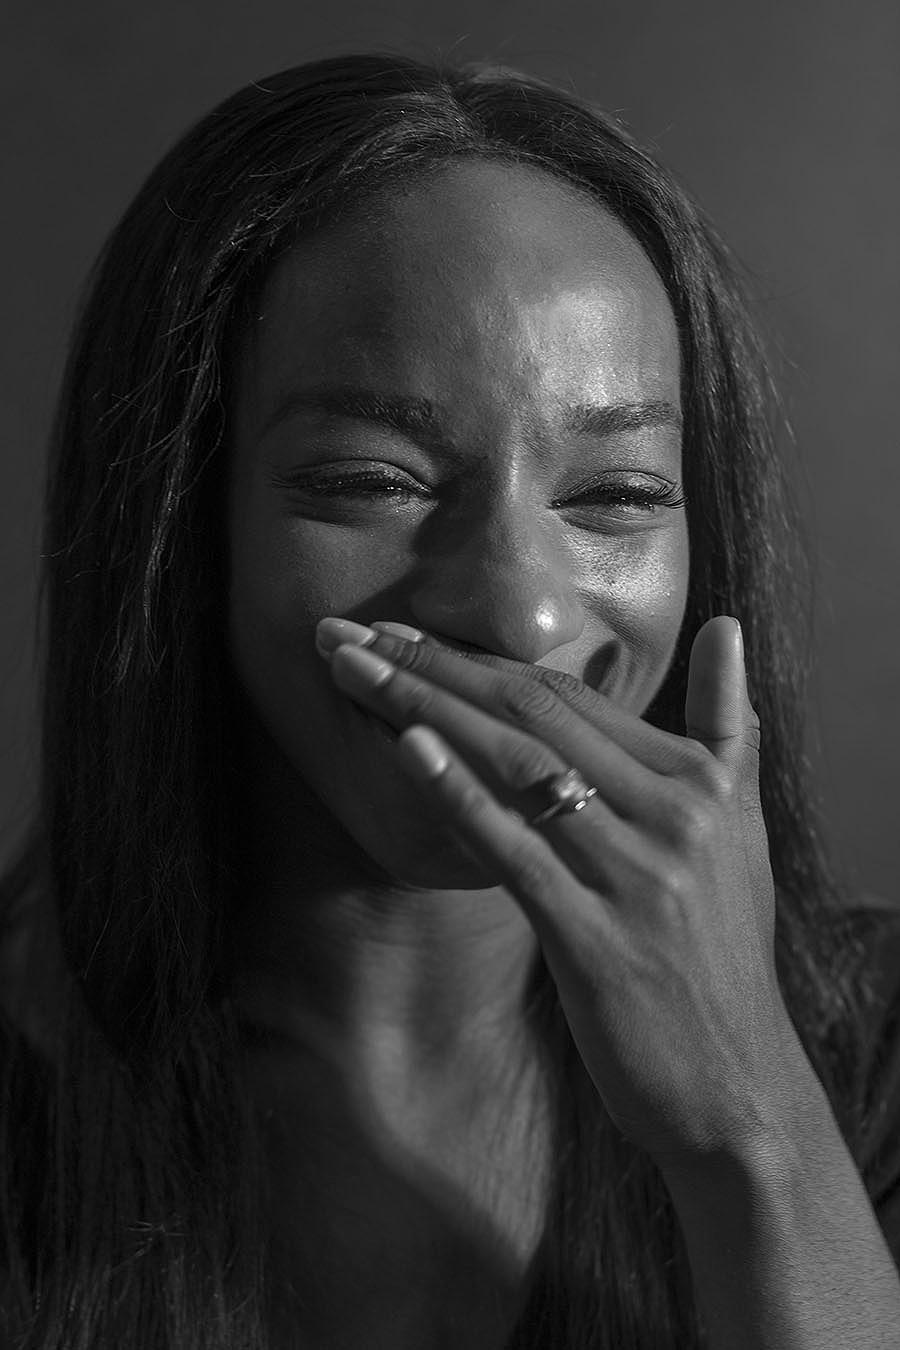 Brian_Schoenauer_photography_portraits_headshot_despair_sadness_shock_tears_emotion_athletics_defeat_loss_black_and_white_loss